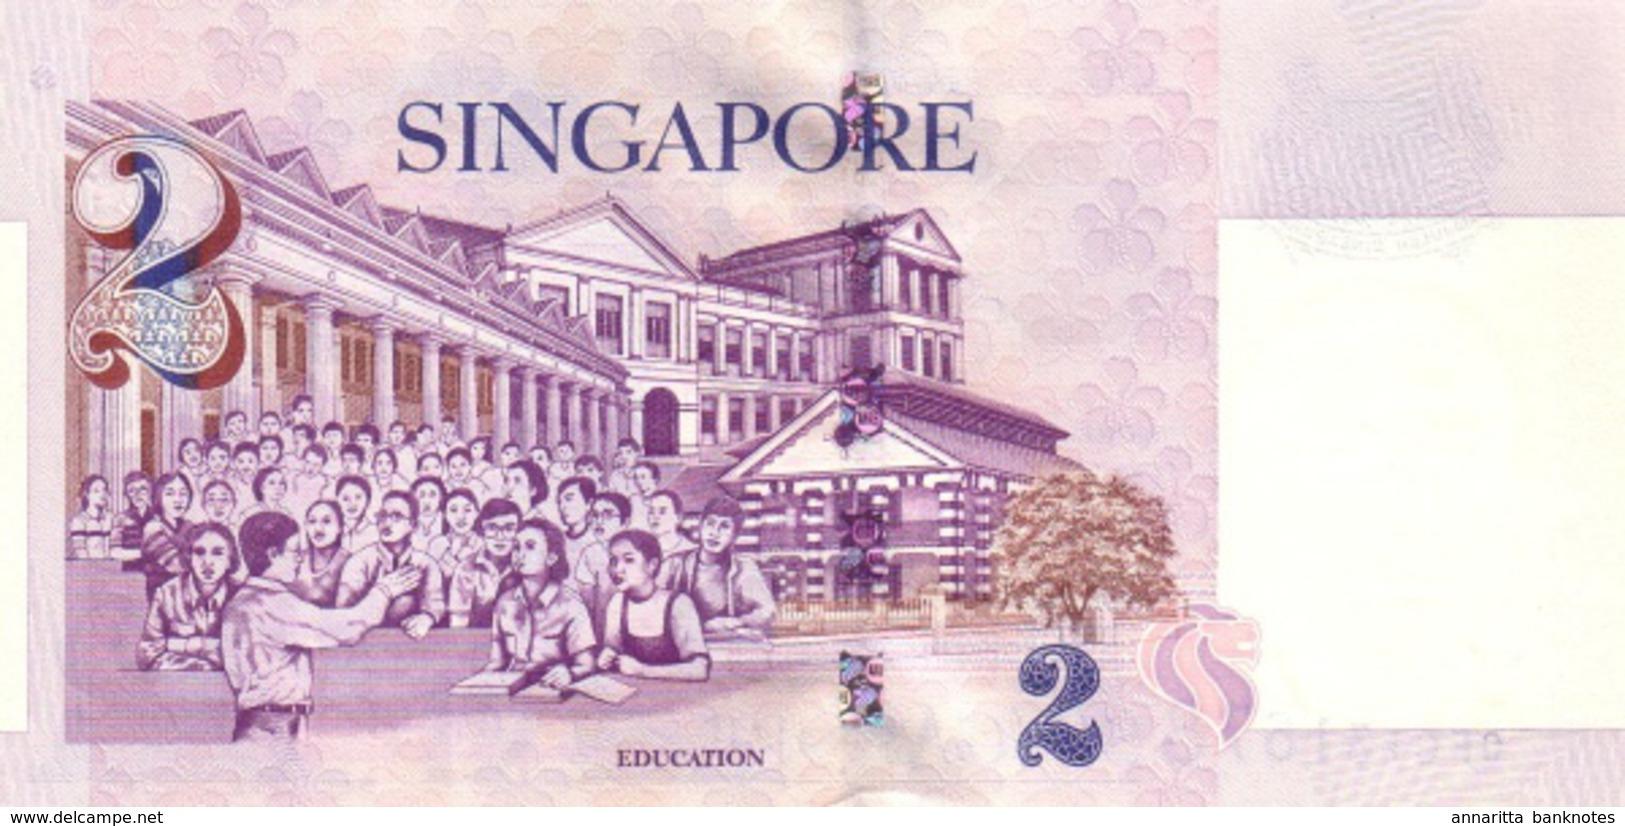 SINGAPORE 2 DOLLARS ND (1999) P-38a UNC  [SG132a] - Singapore